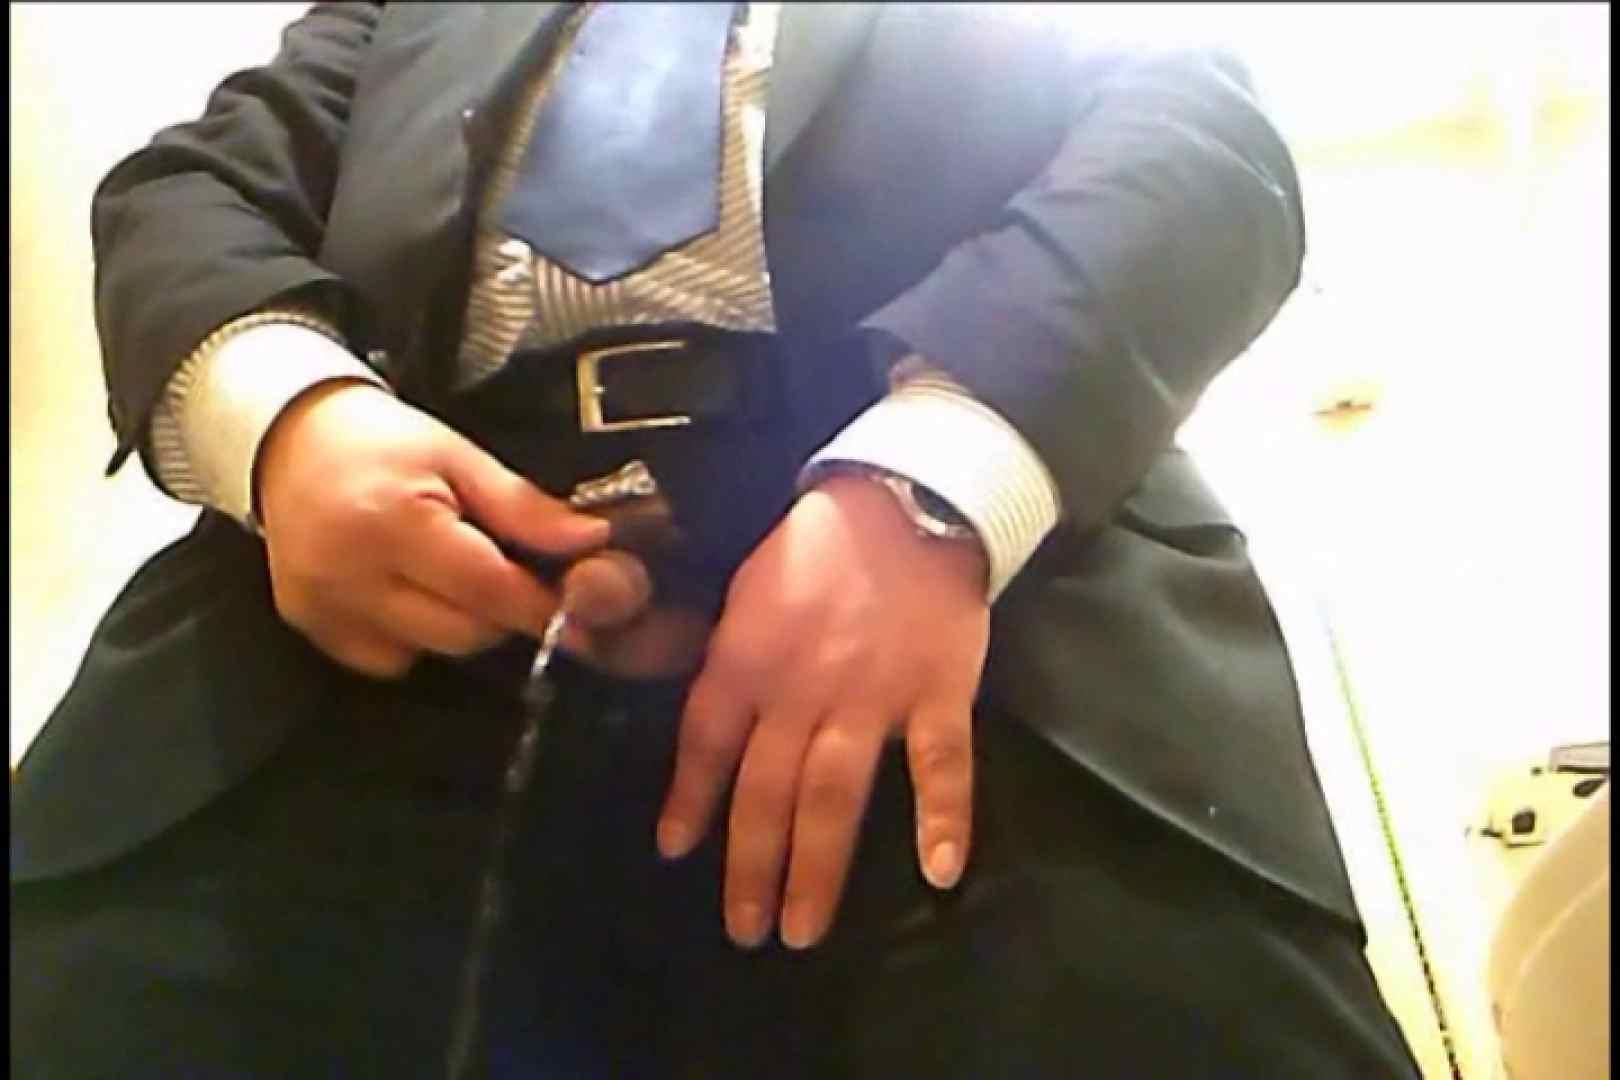 Gボーイ初投稿!掴み取りさんの洗面所覗き!in新幹線!VOL.05 リーマン系男子 | 男・男・男  96枚 57